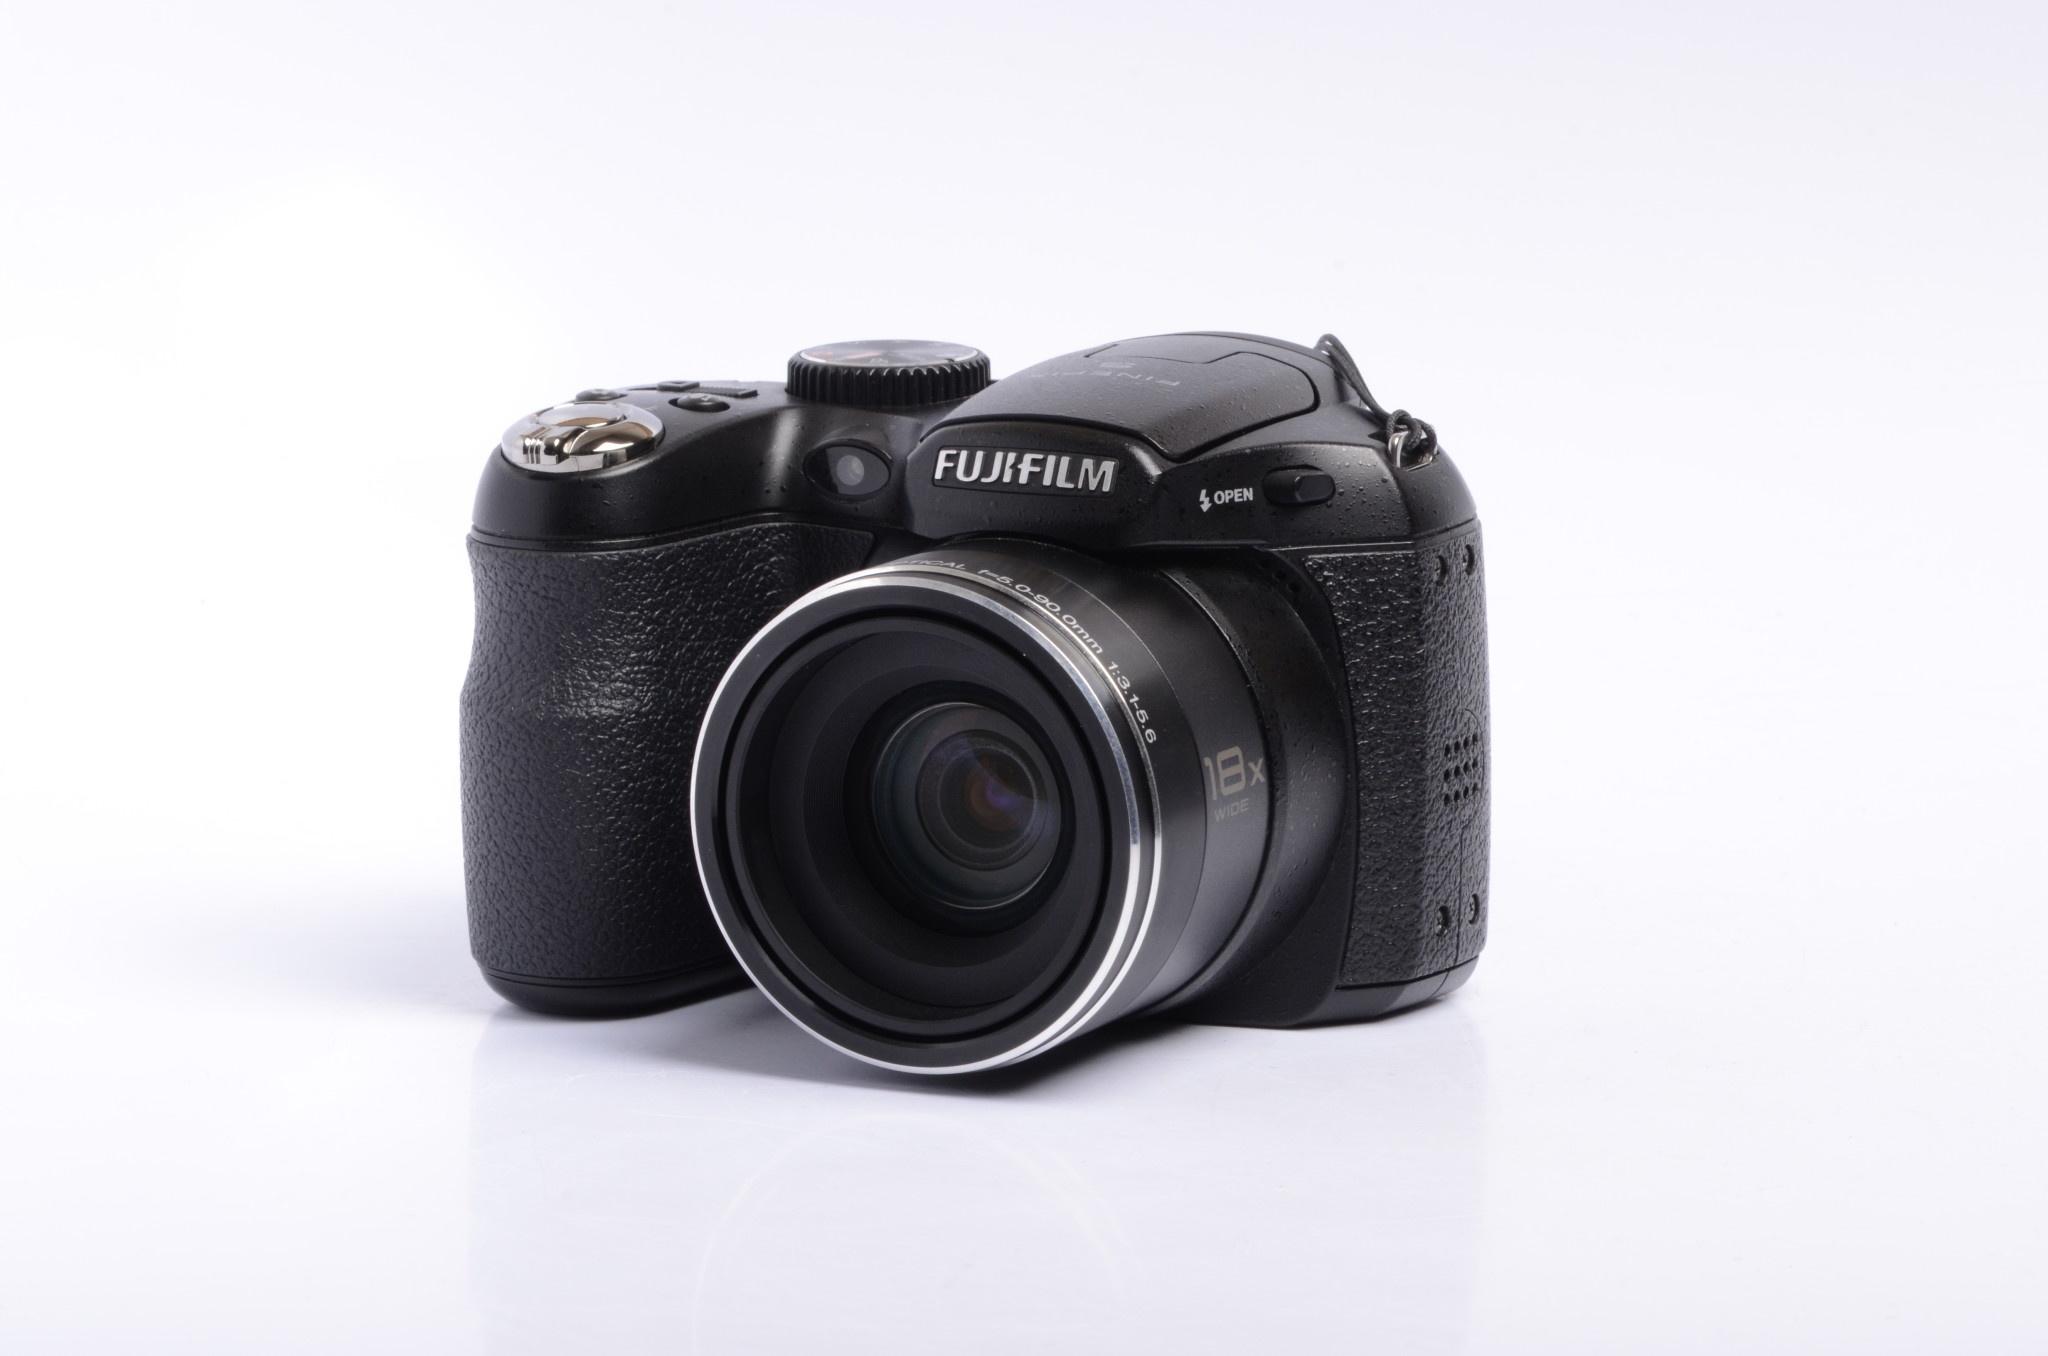 Fujifilm FujiFilm Finepix S2700 HD SN: 0SB13501